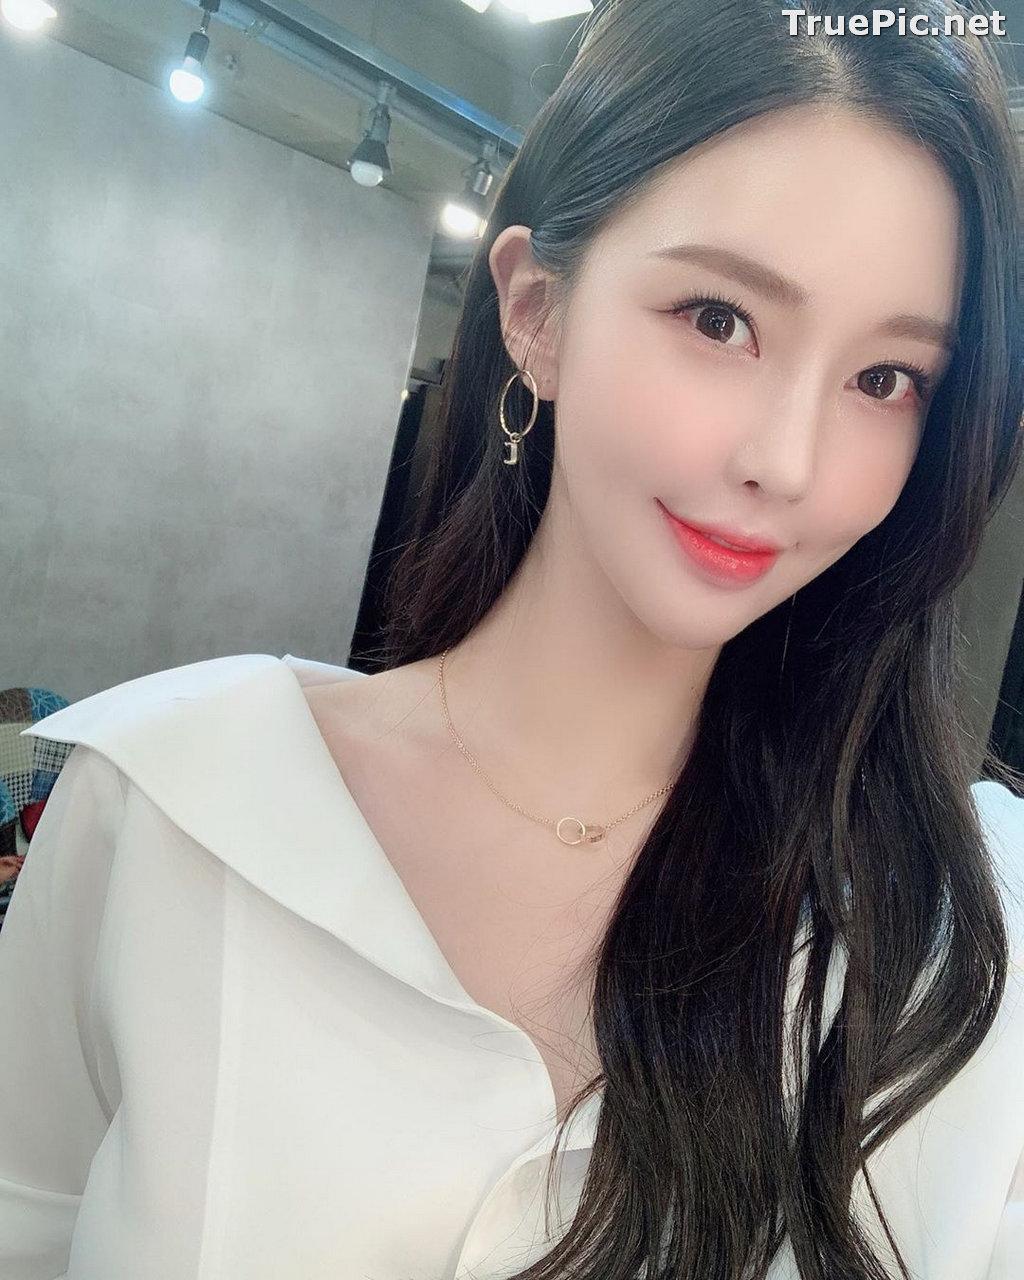 Image Korean Sexy Model - Choi Byeol Ha (최별하) Hot Photos 2020 - TruePic.net - Picture-3